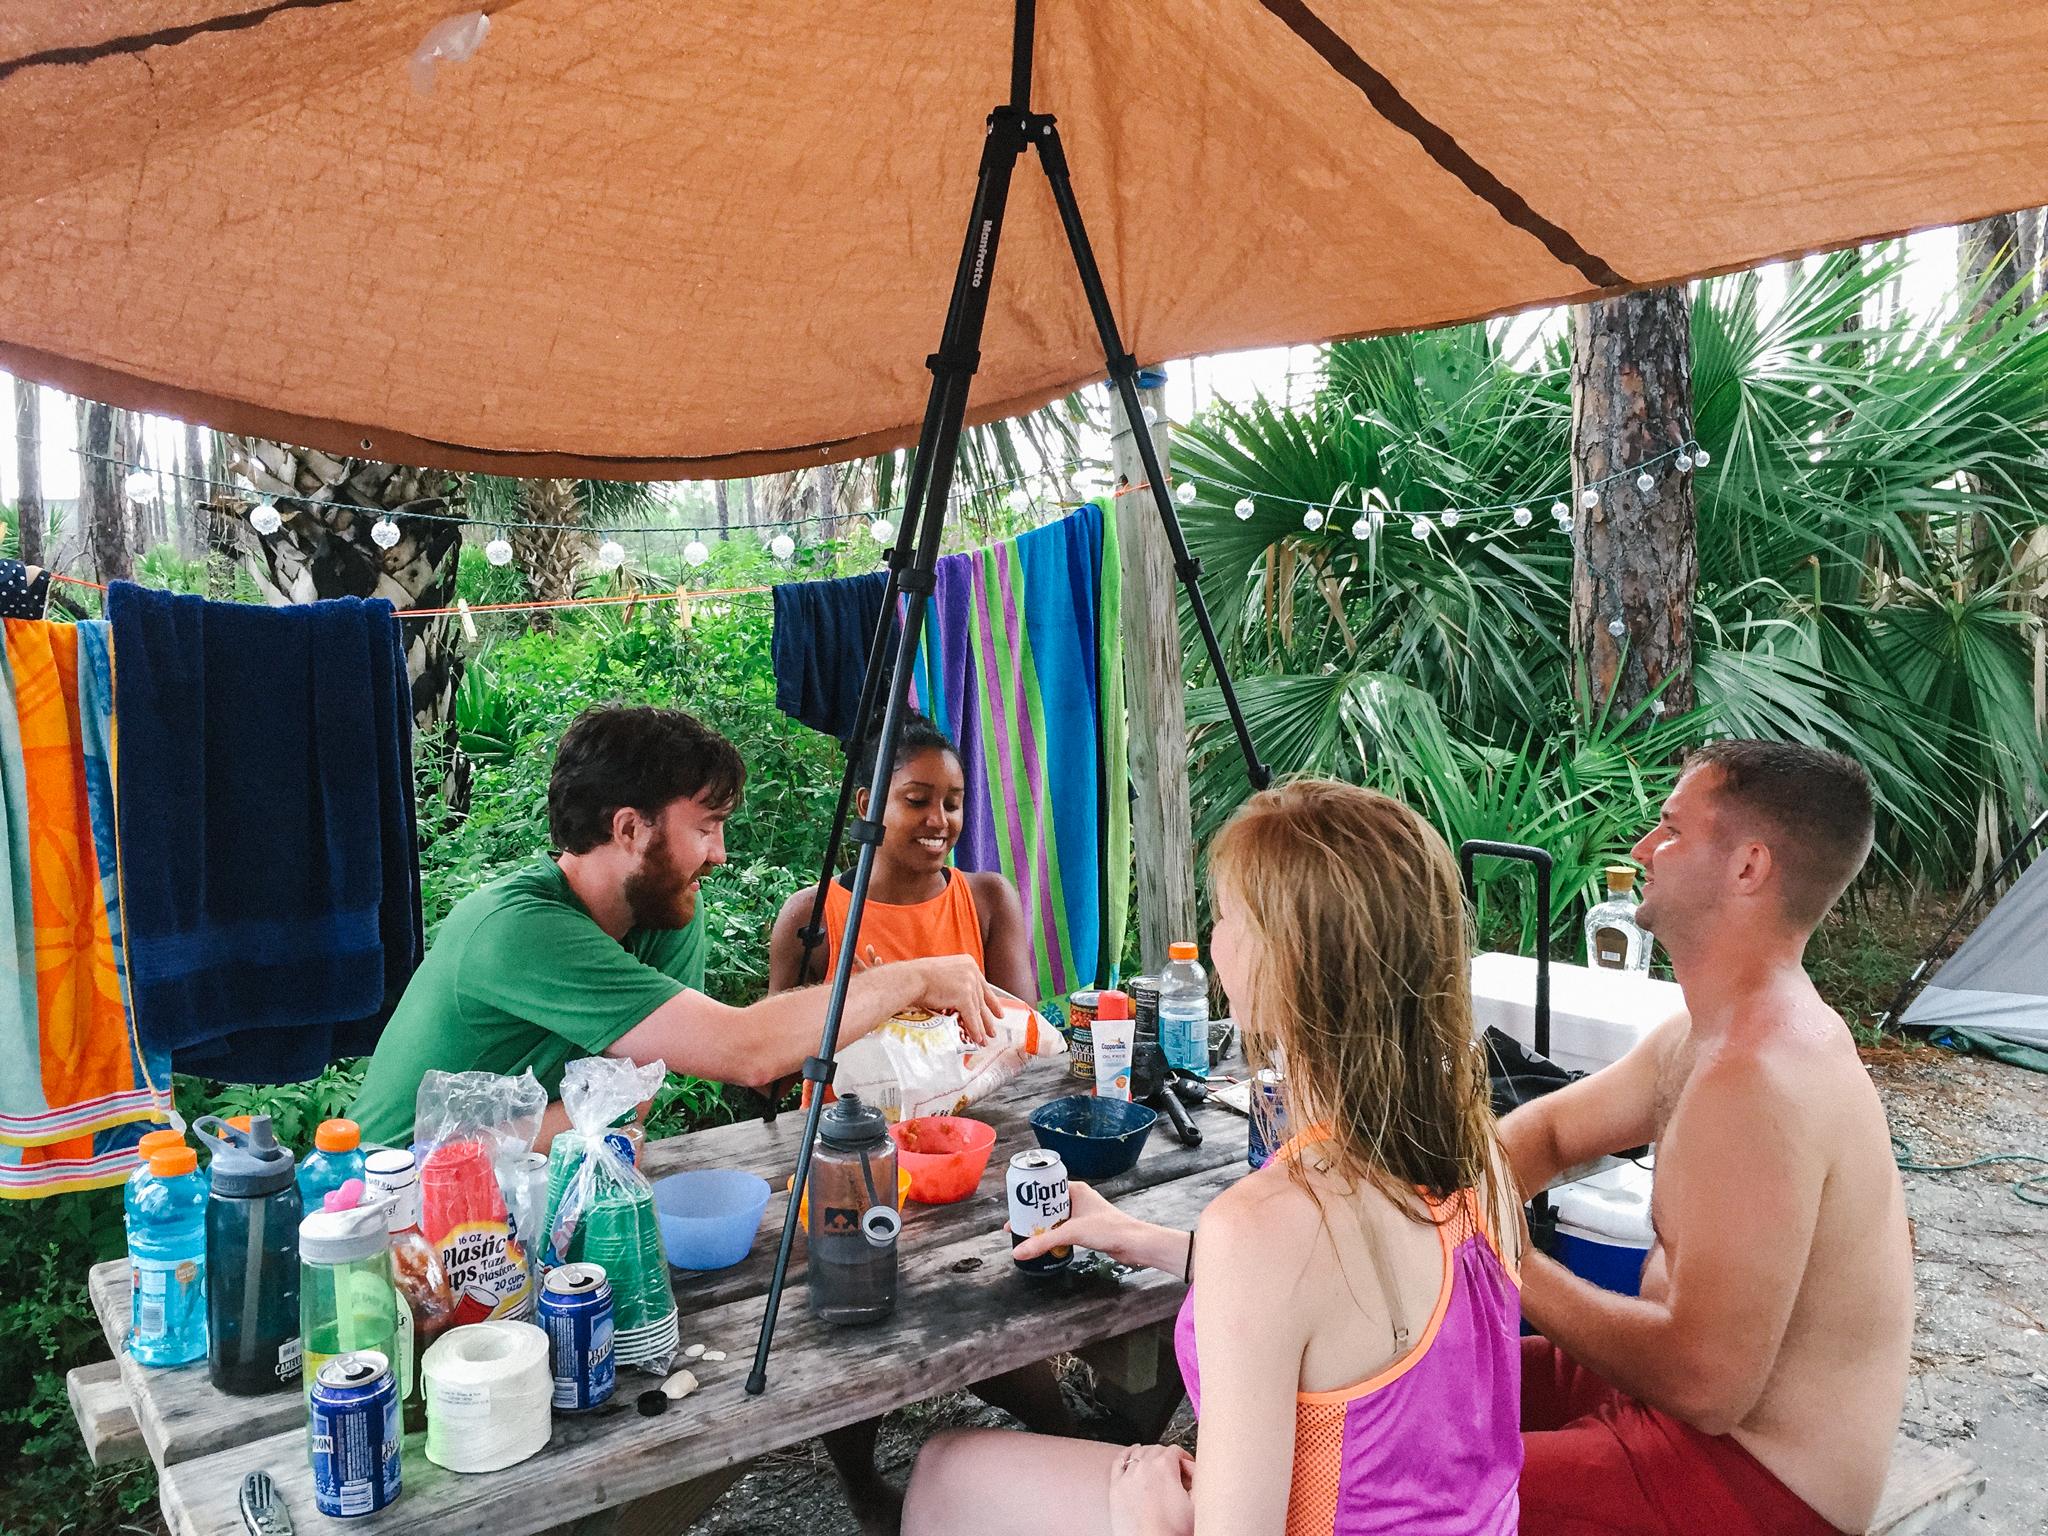 samburkardt_engagement_vacation_beach_cape_san_blas_florida_camping_gopro_0018.jpg